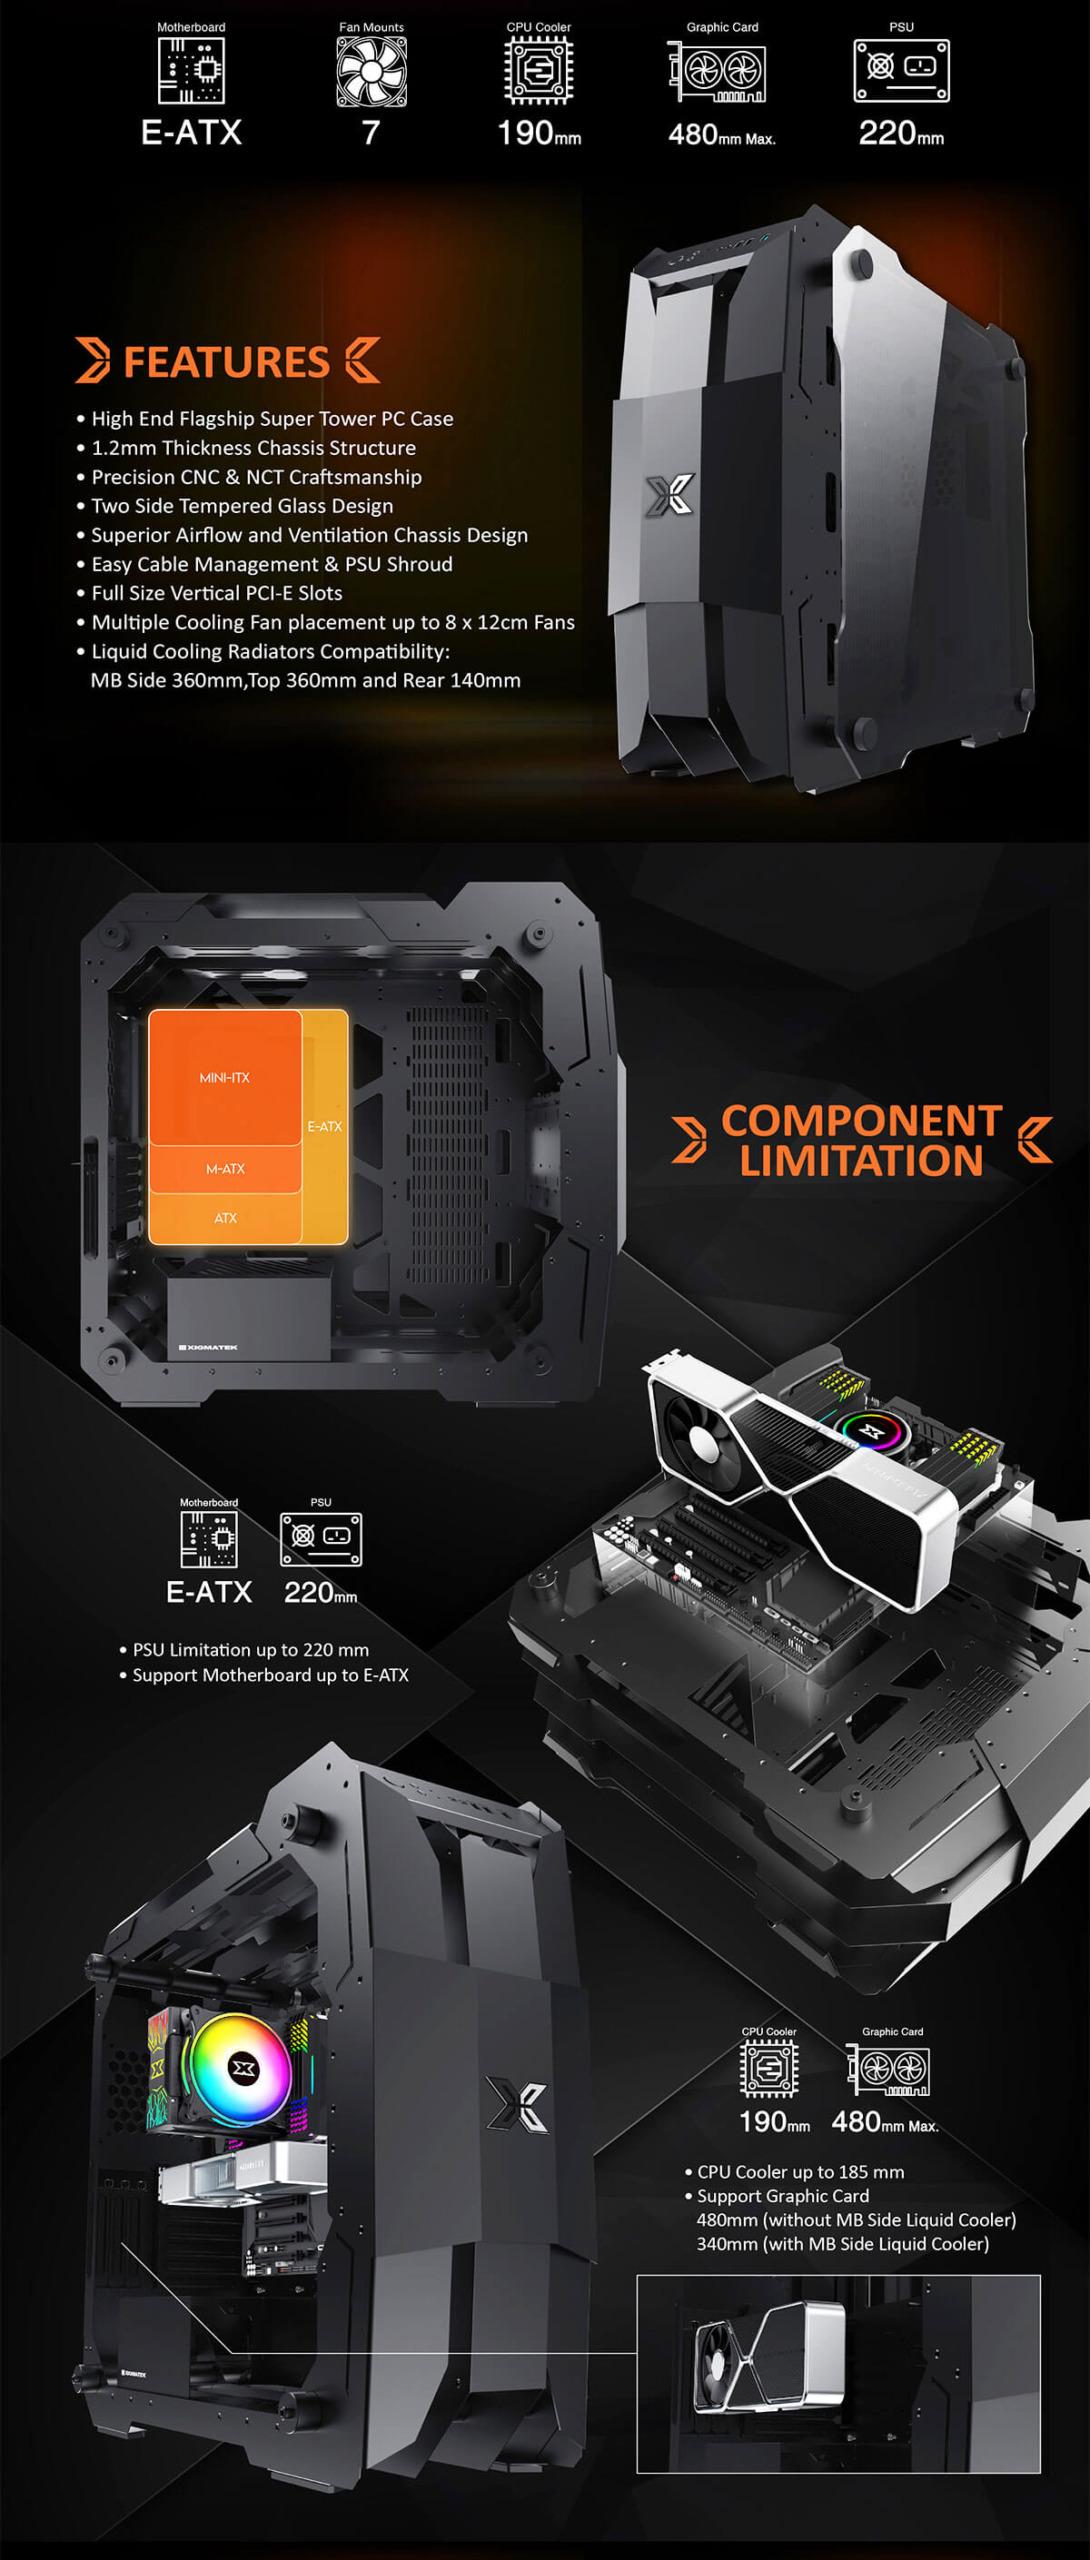 Case Xigmatek X7 Super Tower Black Features 2